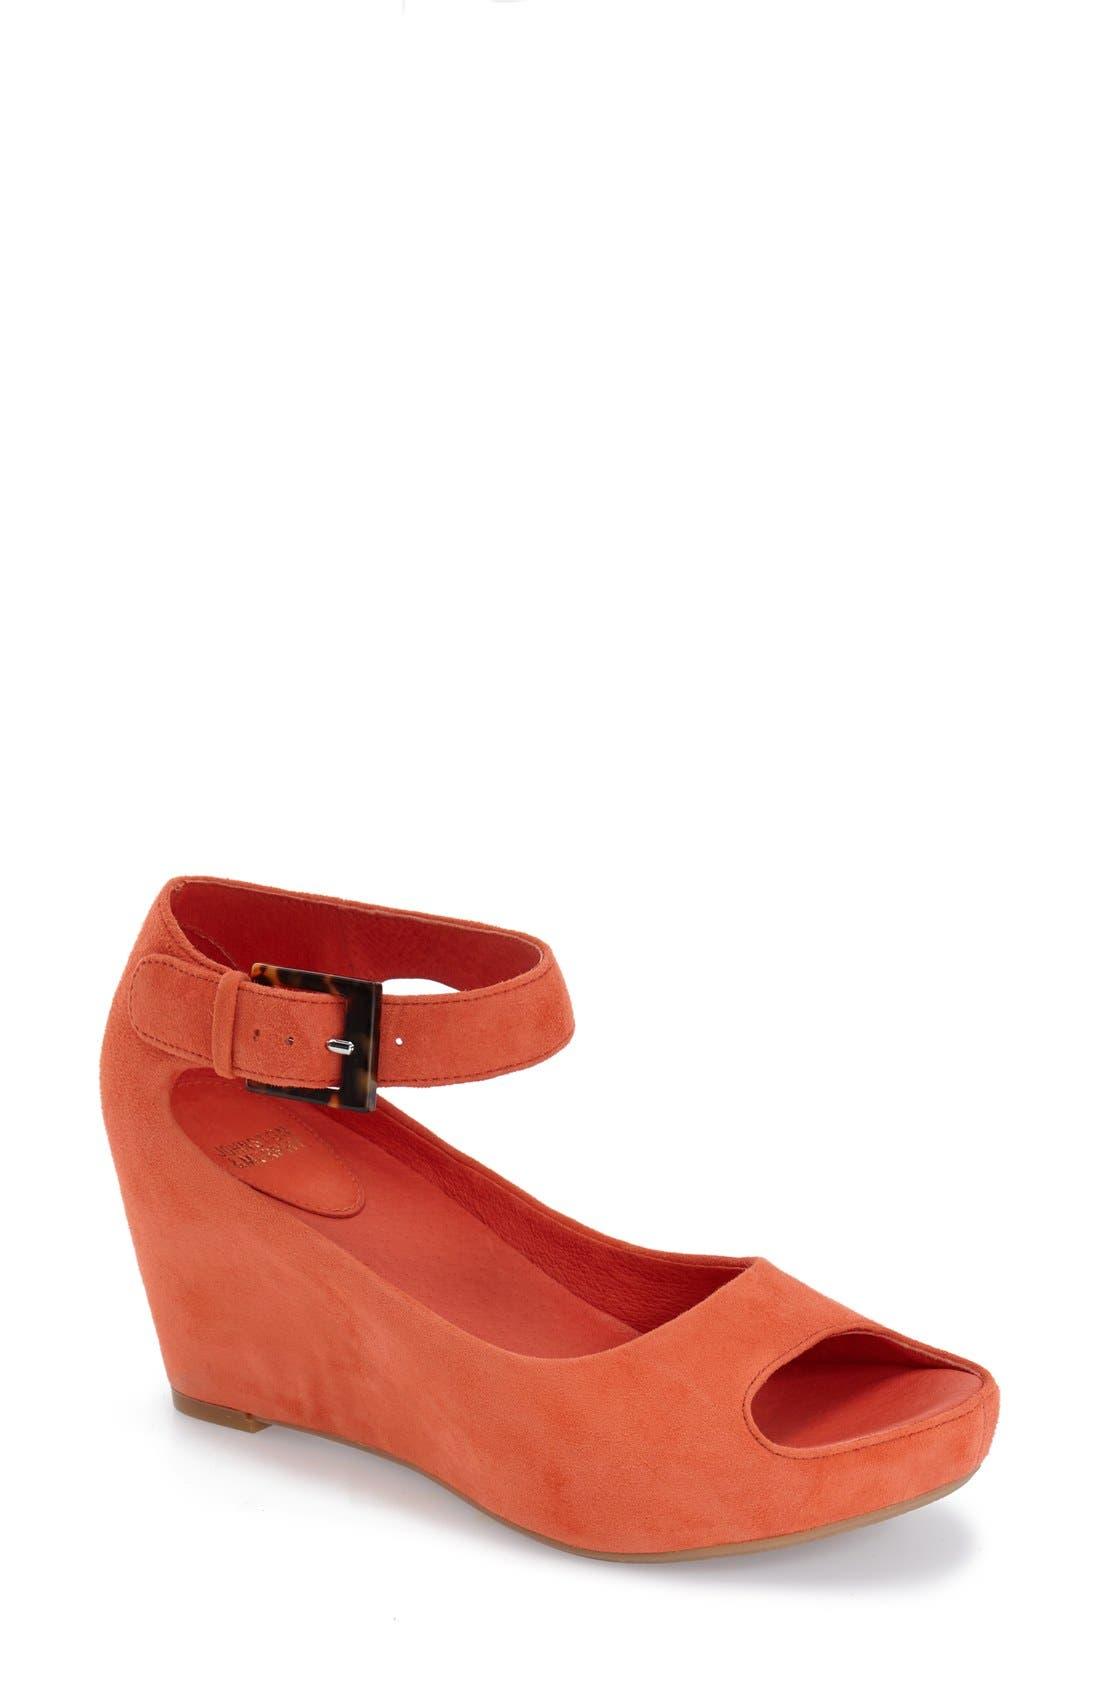 'Tricia' Ankle Strap Sandal,                             Main thumbnail 11, color,